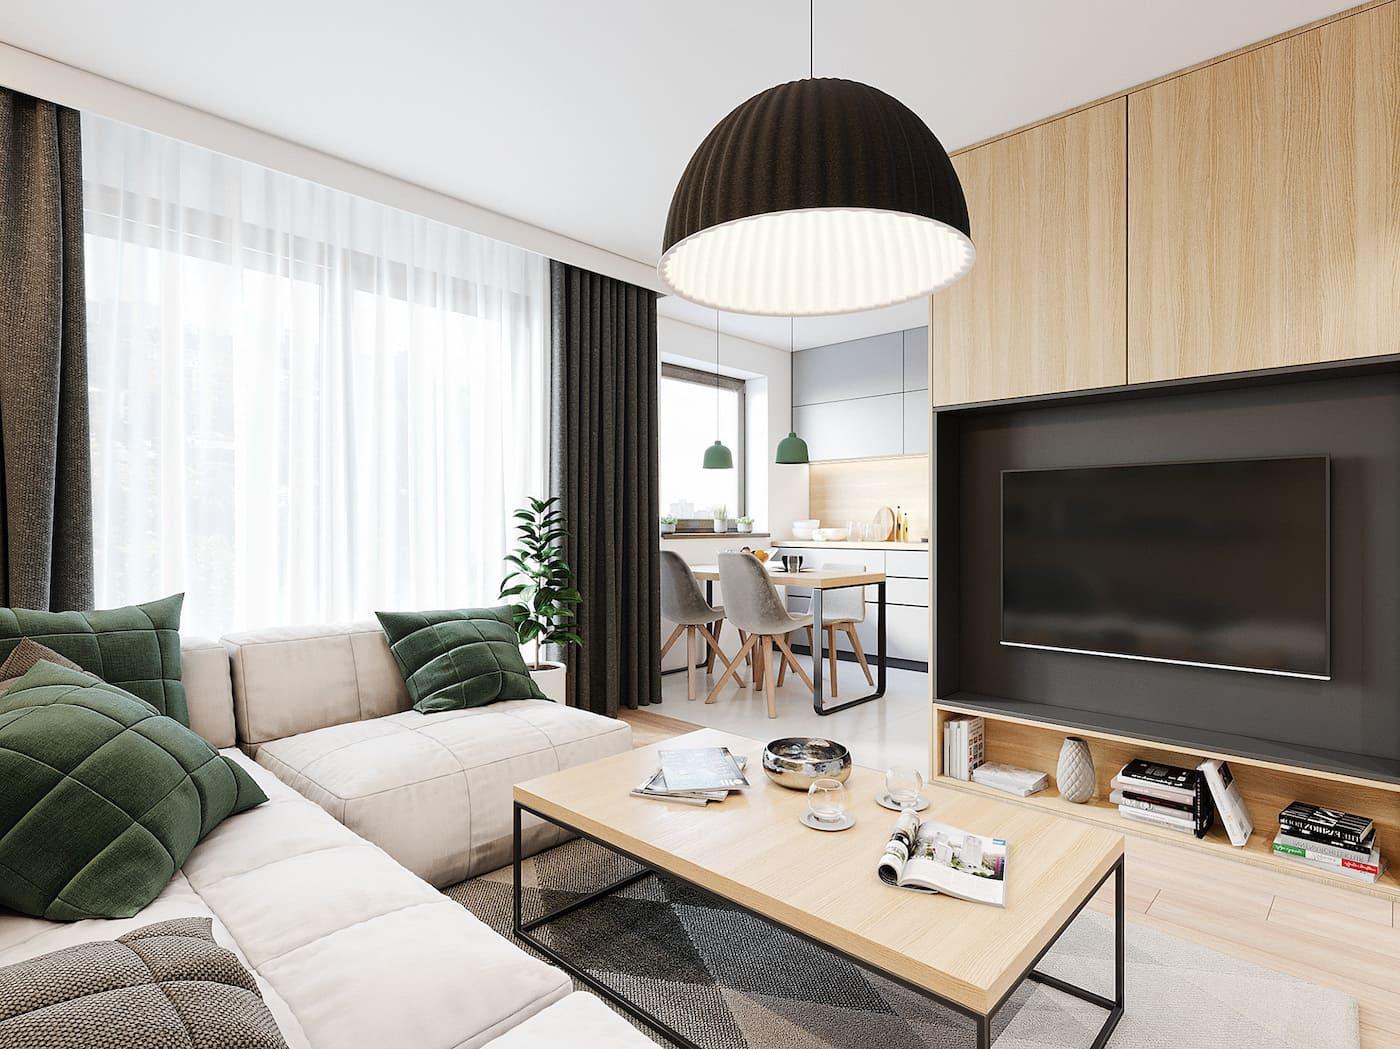 модный дизайн интерьера квартиры фото 68